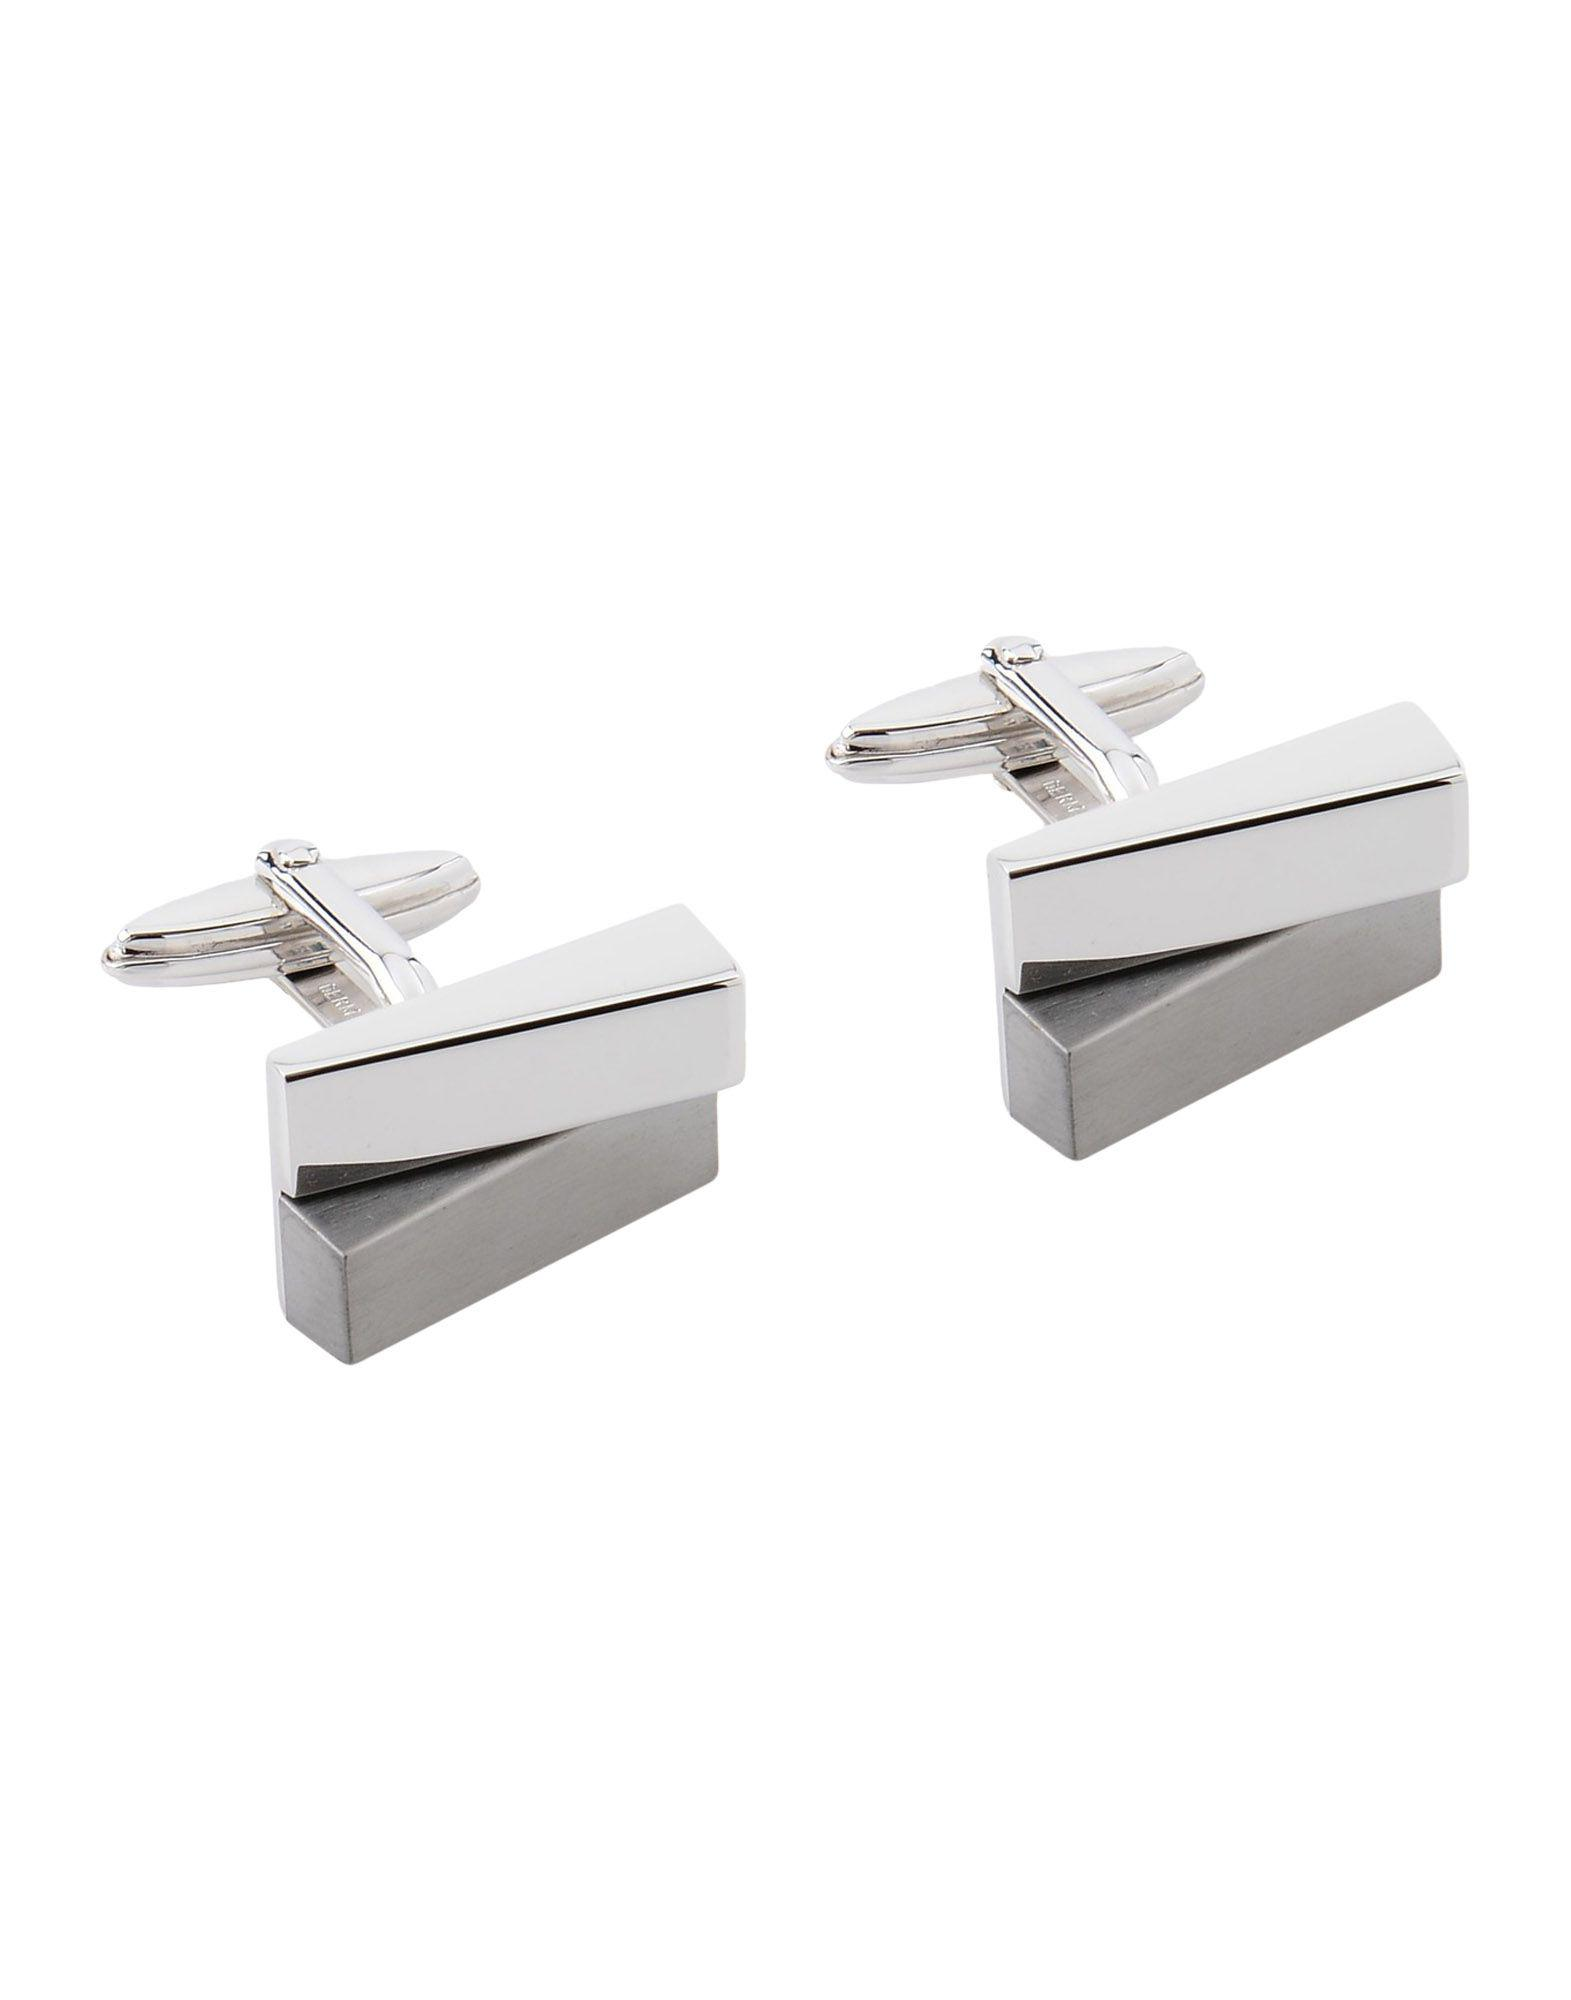 Lanvin square shaped cufflinks - Metallic pQLE0aBP5t